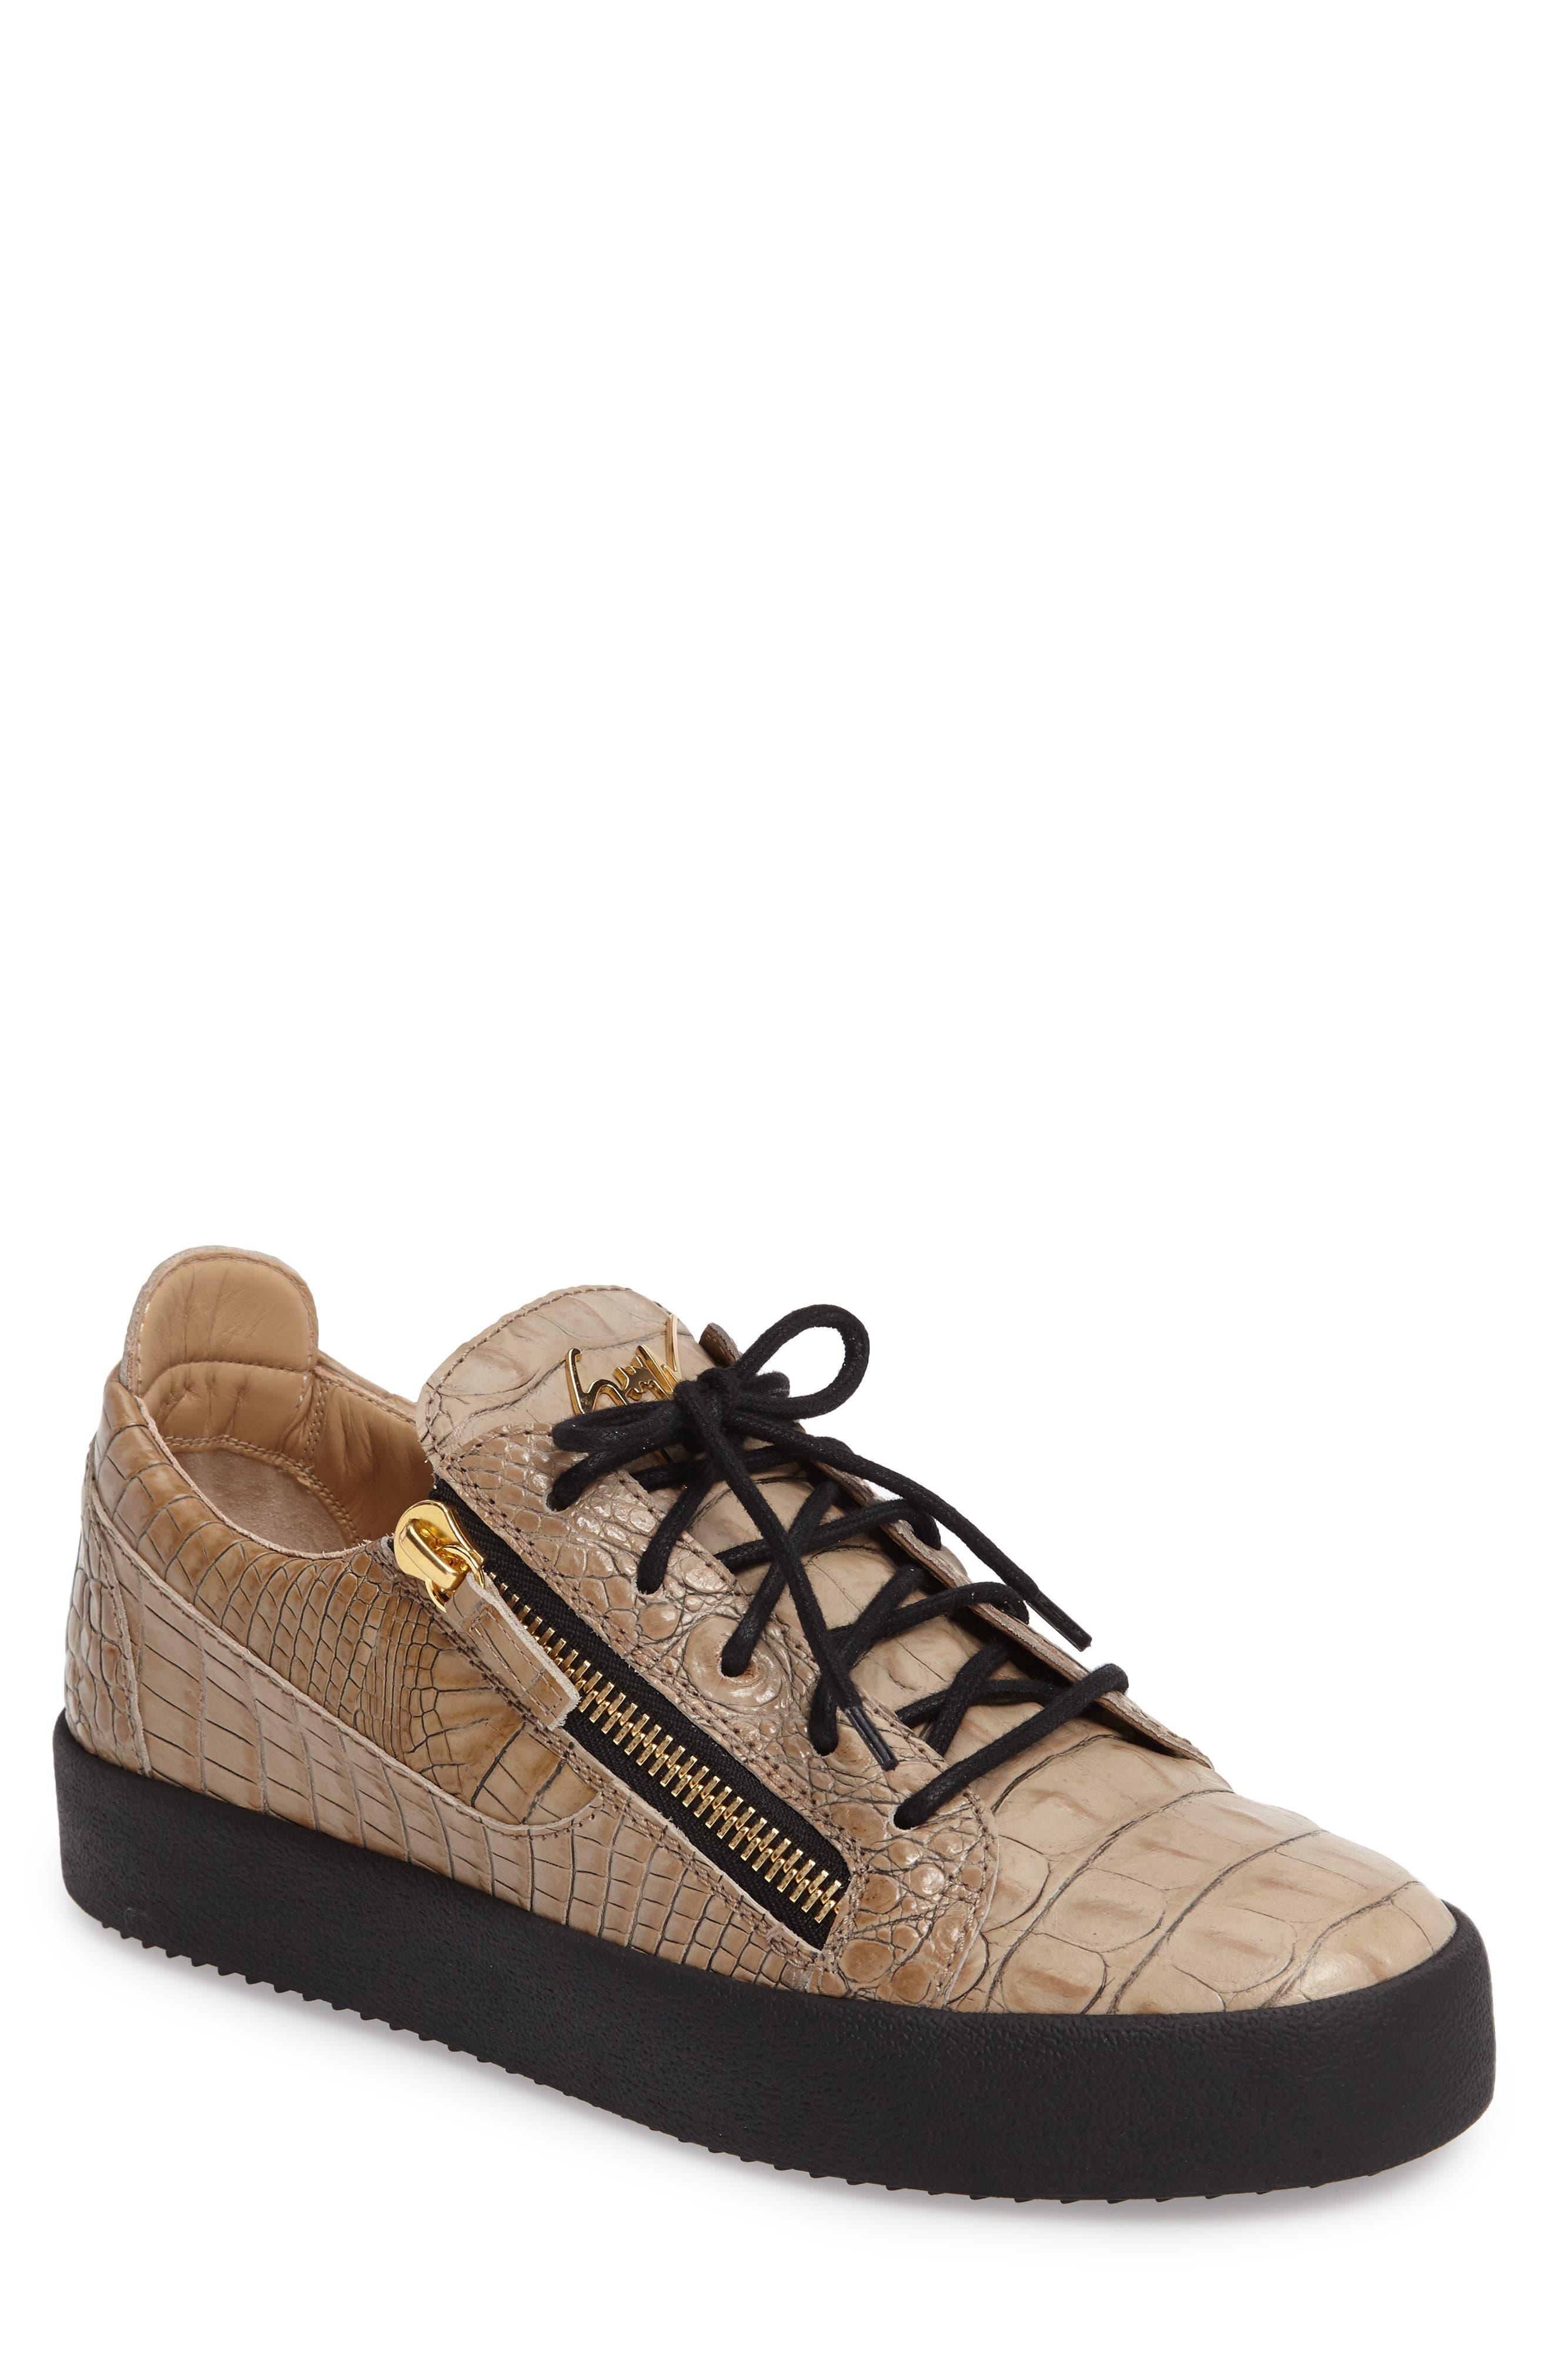 Main Image - Giuseppe Zanotti Low Top Sneaker (Men)